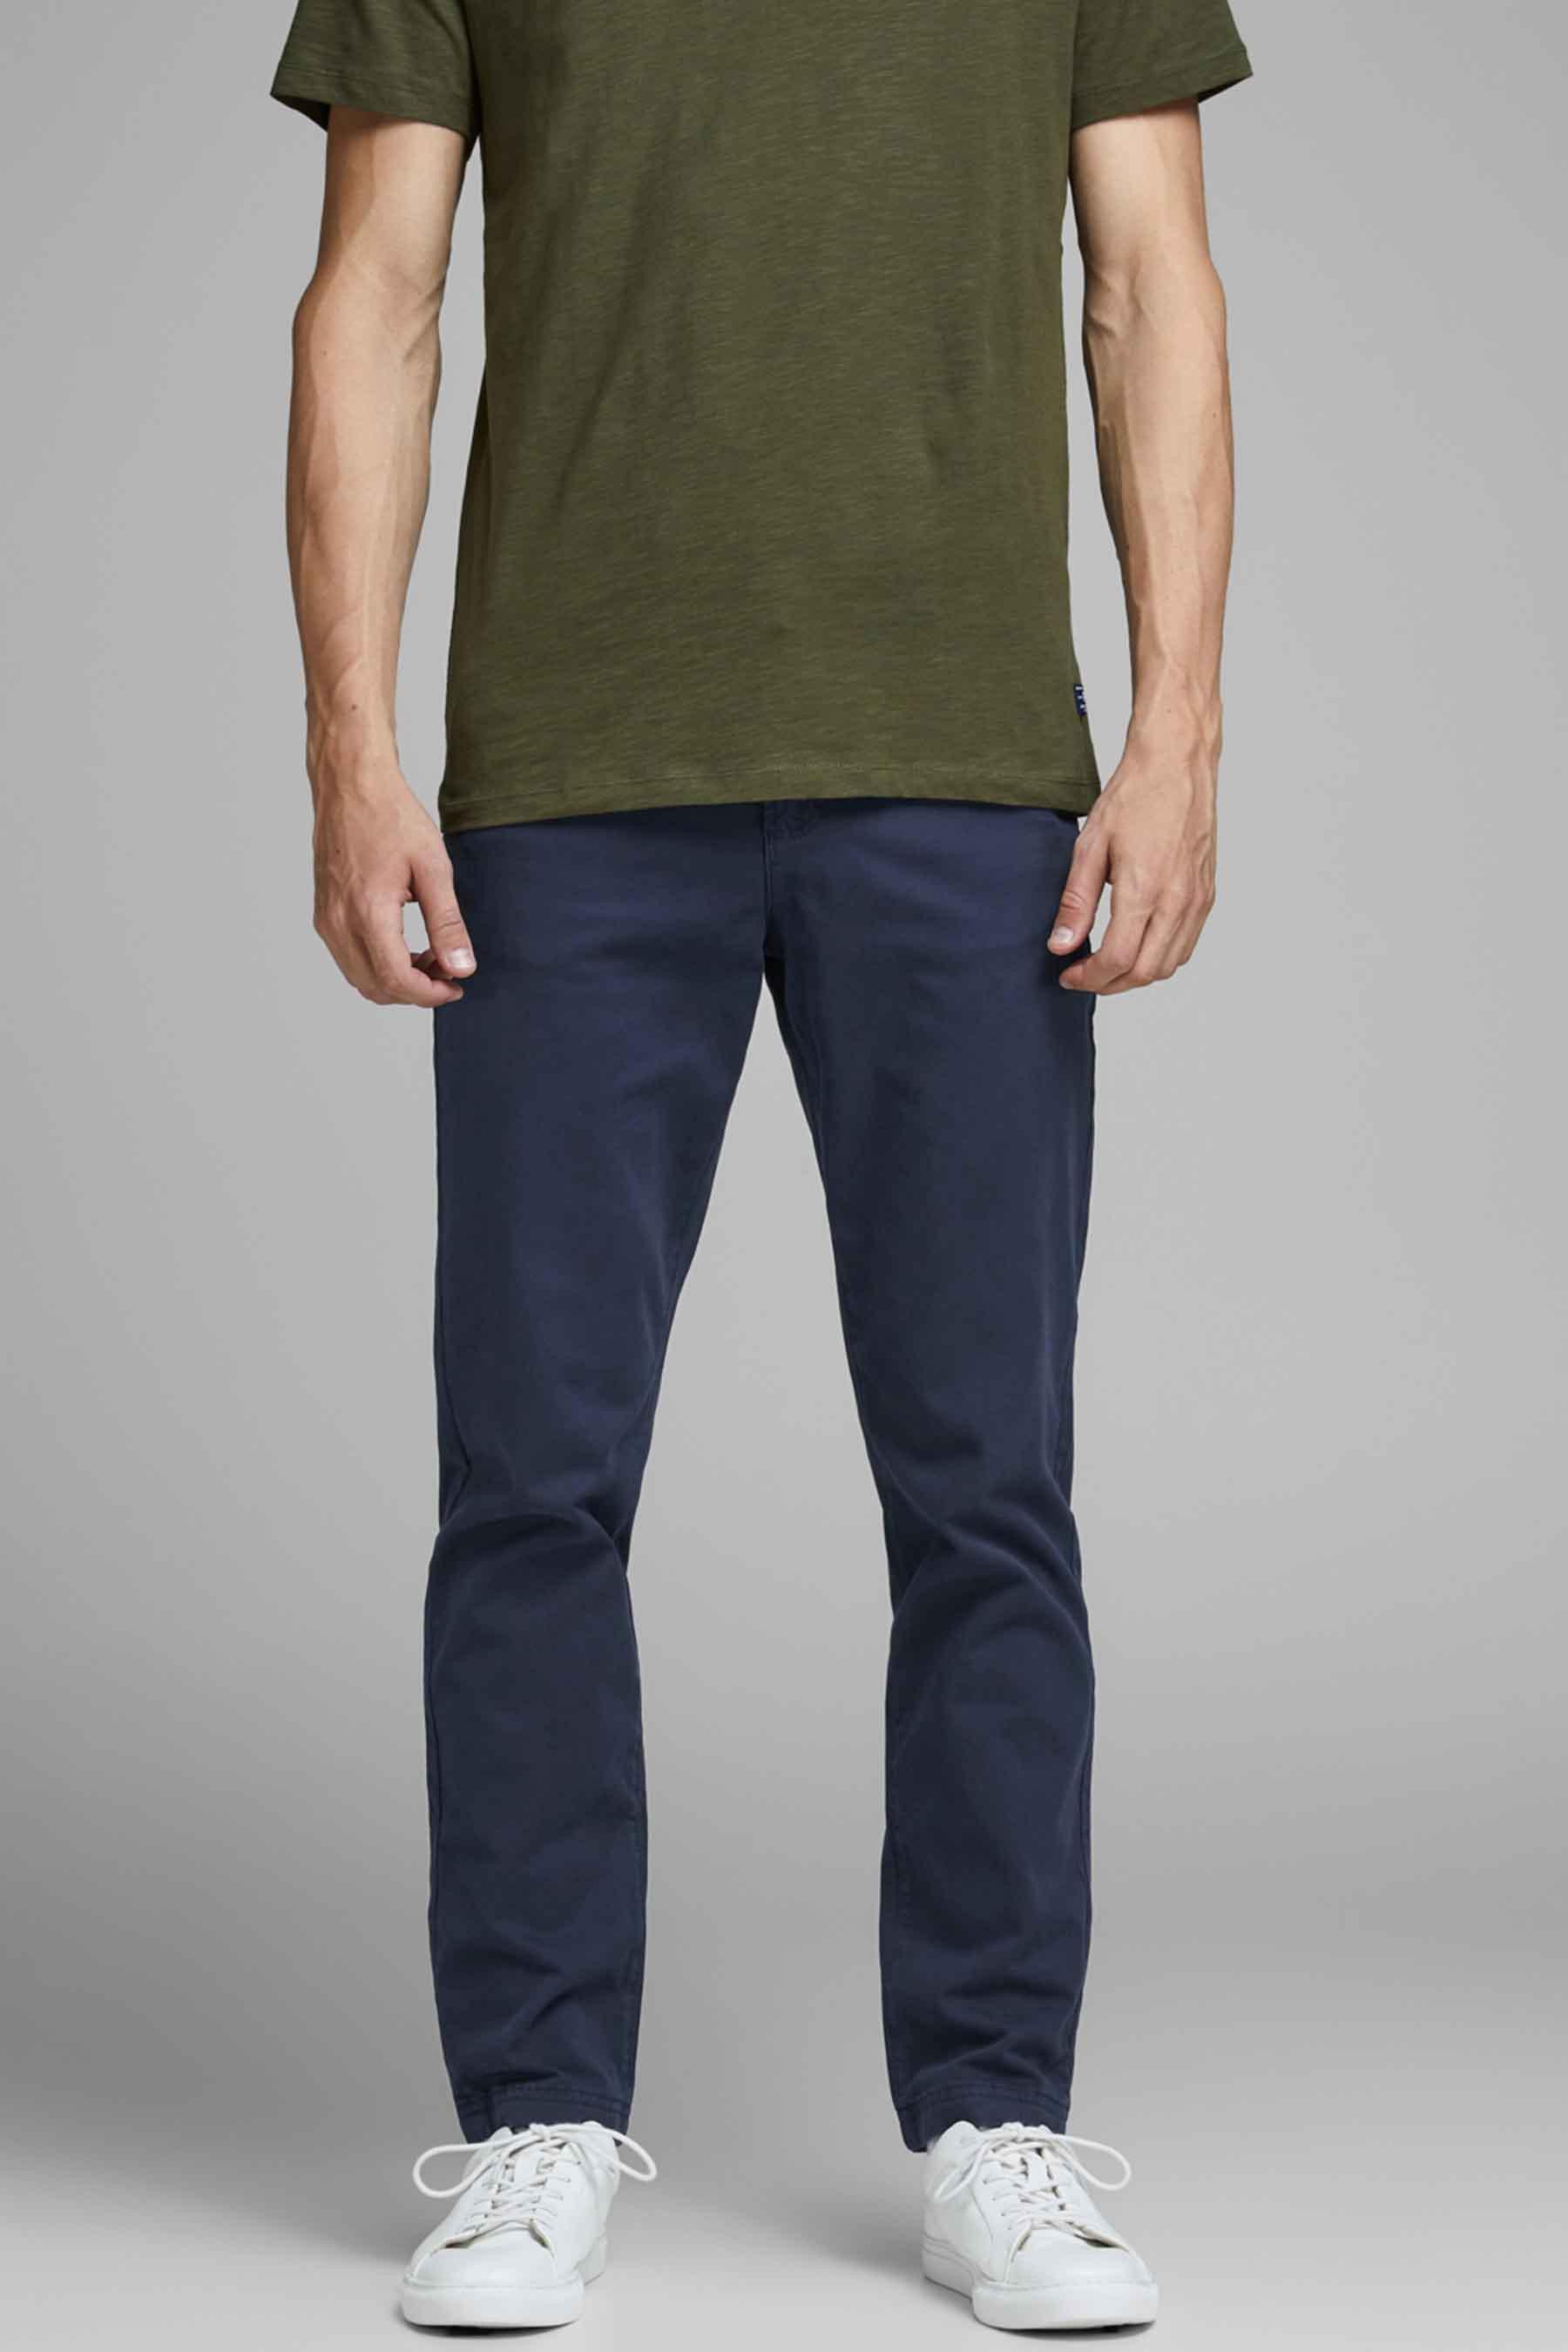 Jack & Jones Jeans Intelligenc Chino, Blauw, Heren, Maat: 27x32/28x32/28x34/29x3